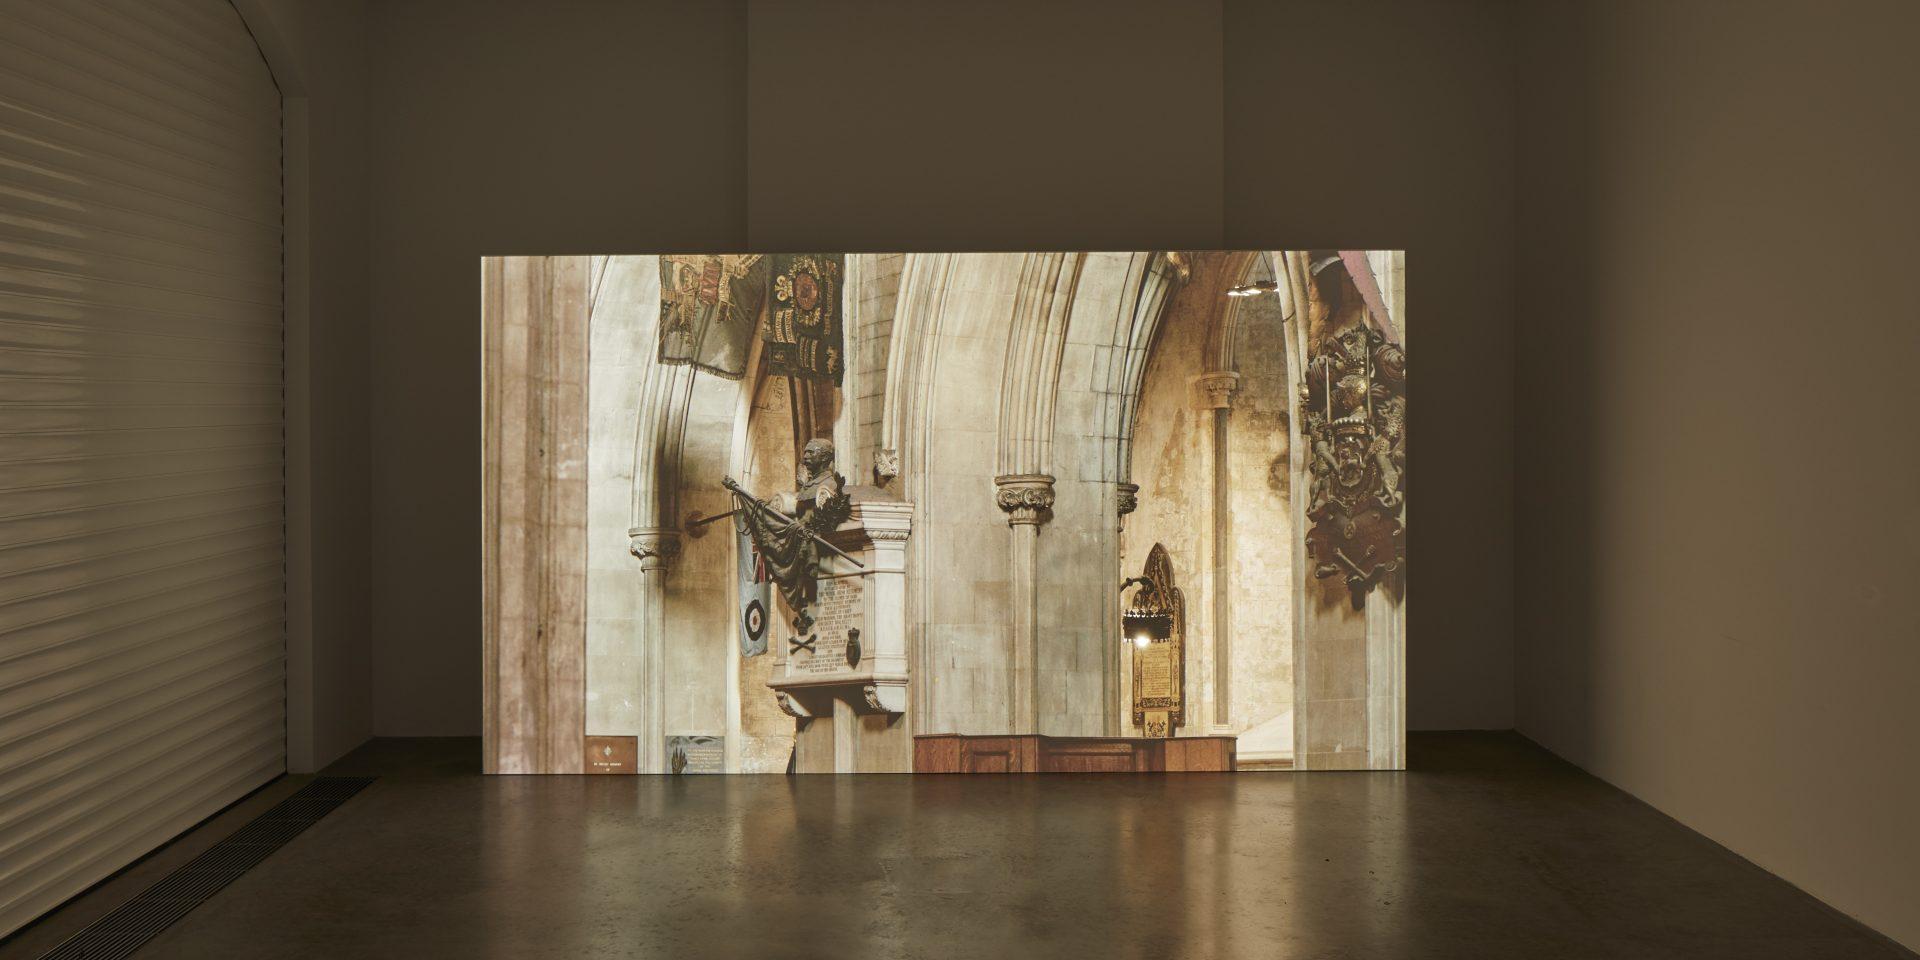 South London Gallery Postgraduate Residency 2019/2020